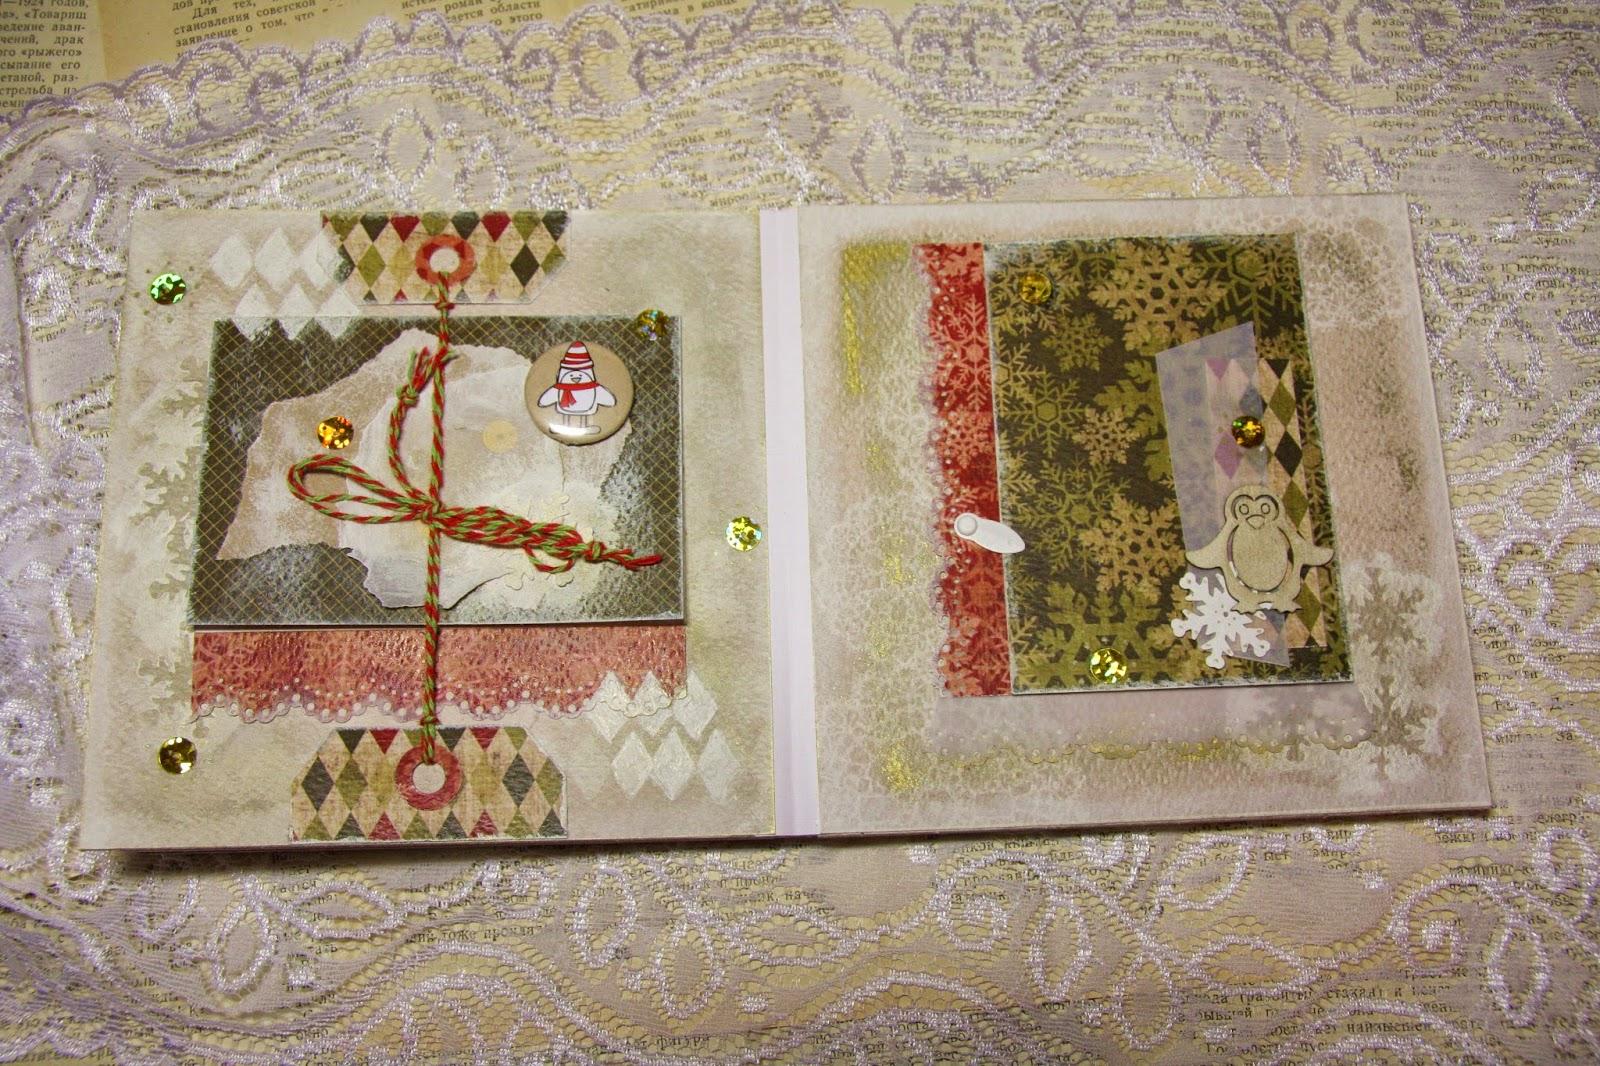 mini album New Year Christmas winter album scrapbooking скрапбукинг зима альбом новый год зимний снег hamster-sensey